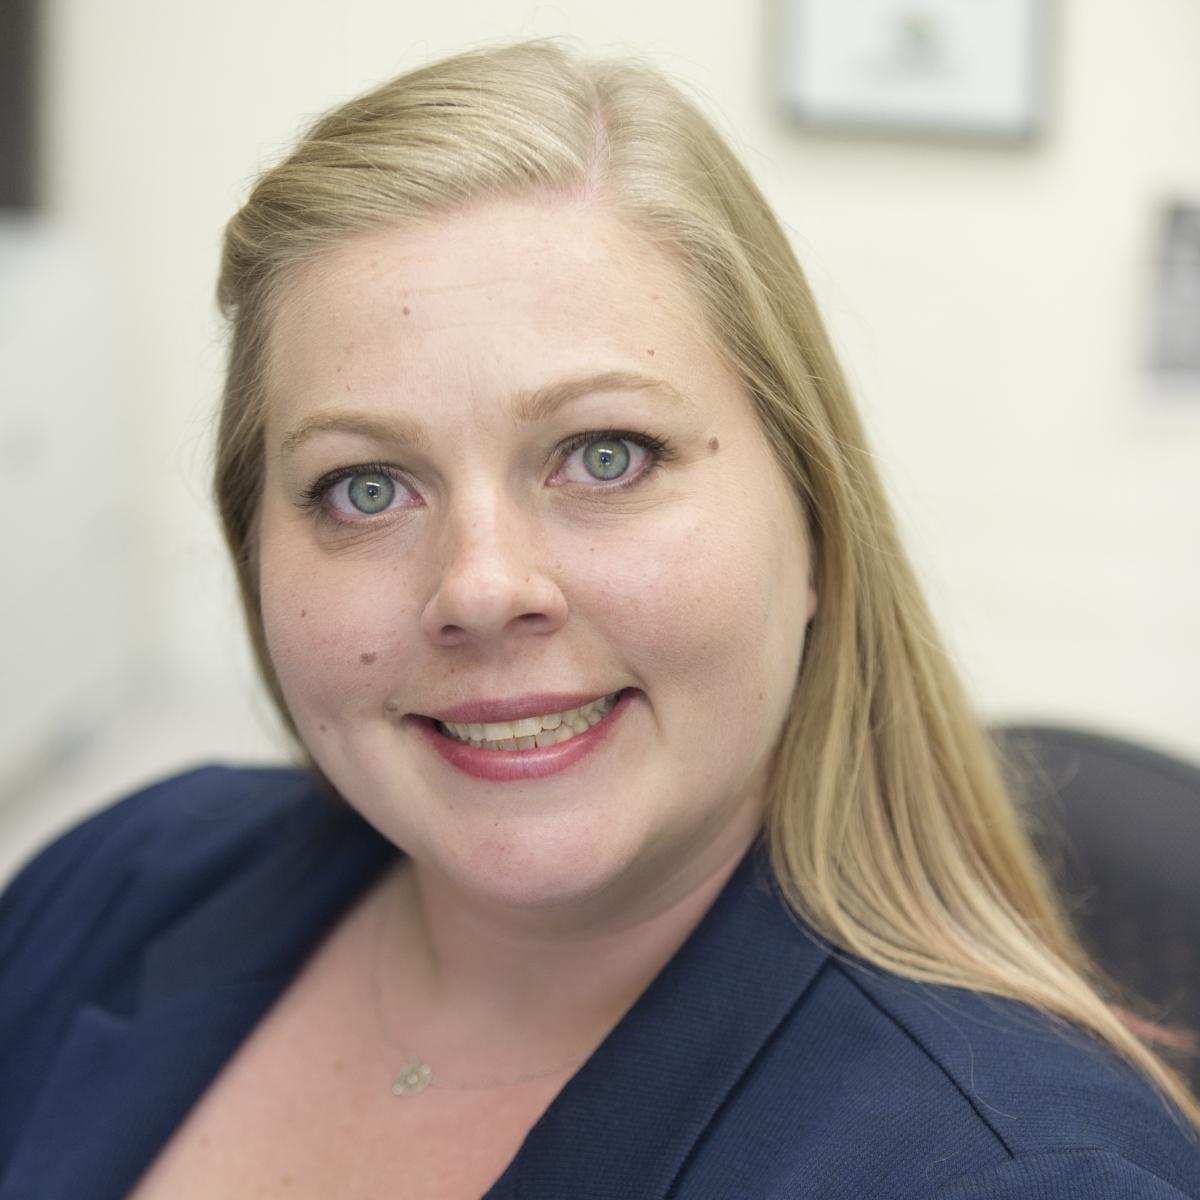 UMass Assistant Professor Jeanne Brunner